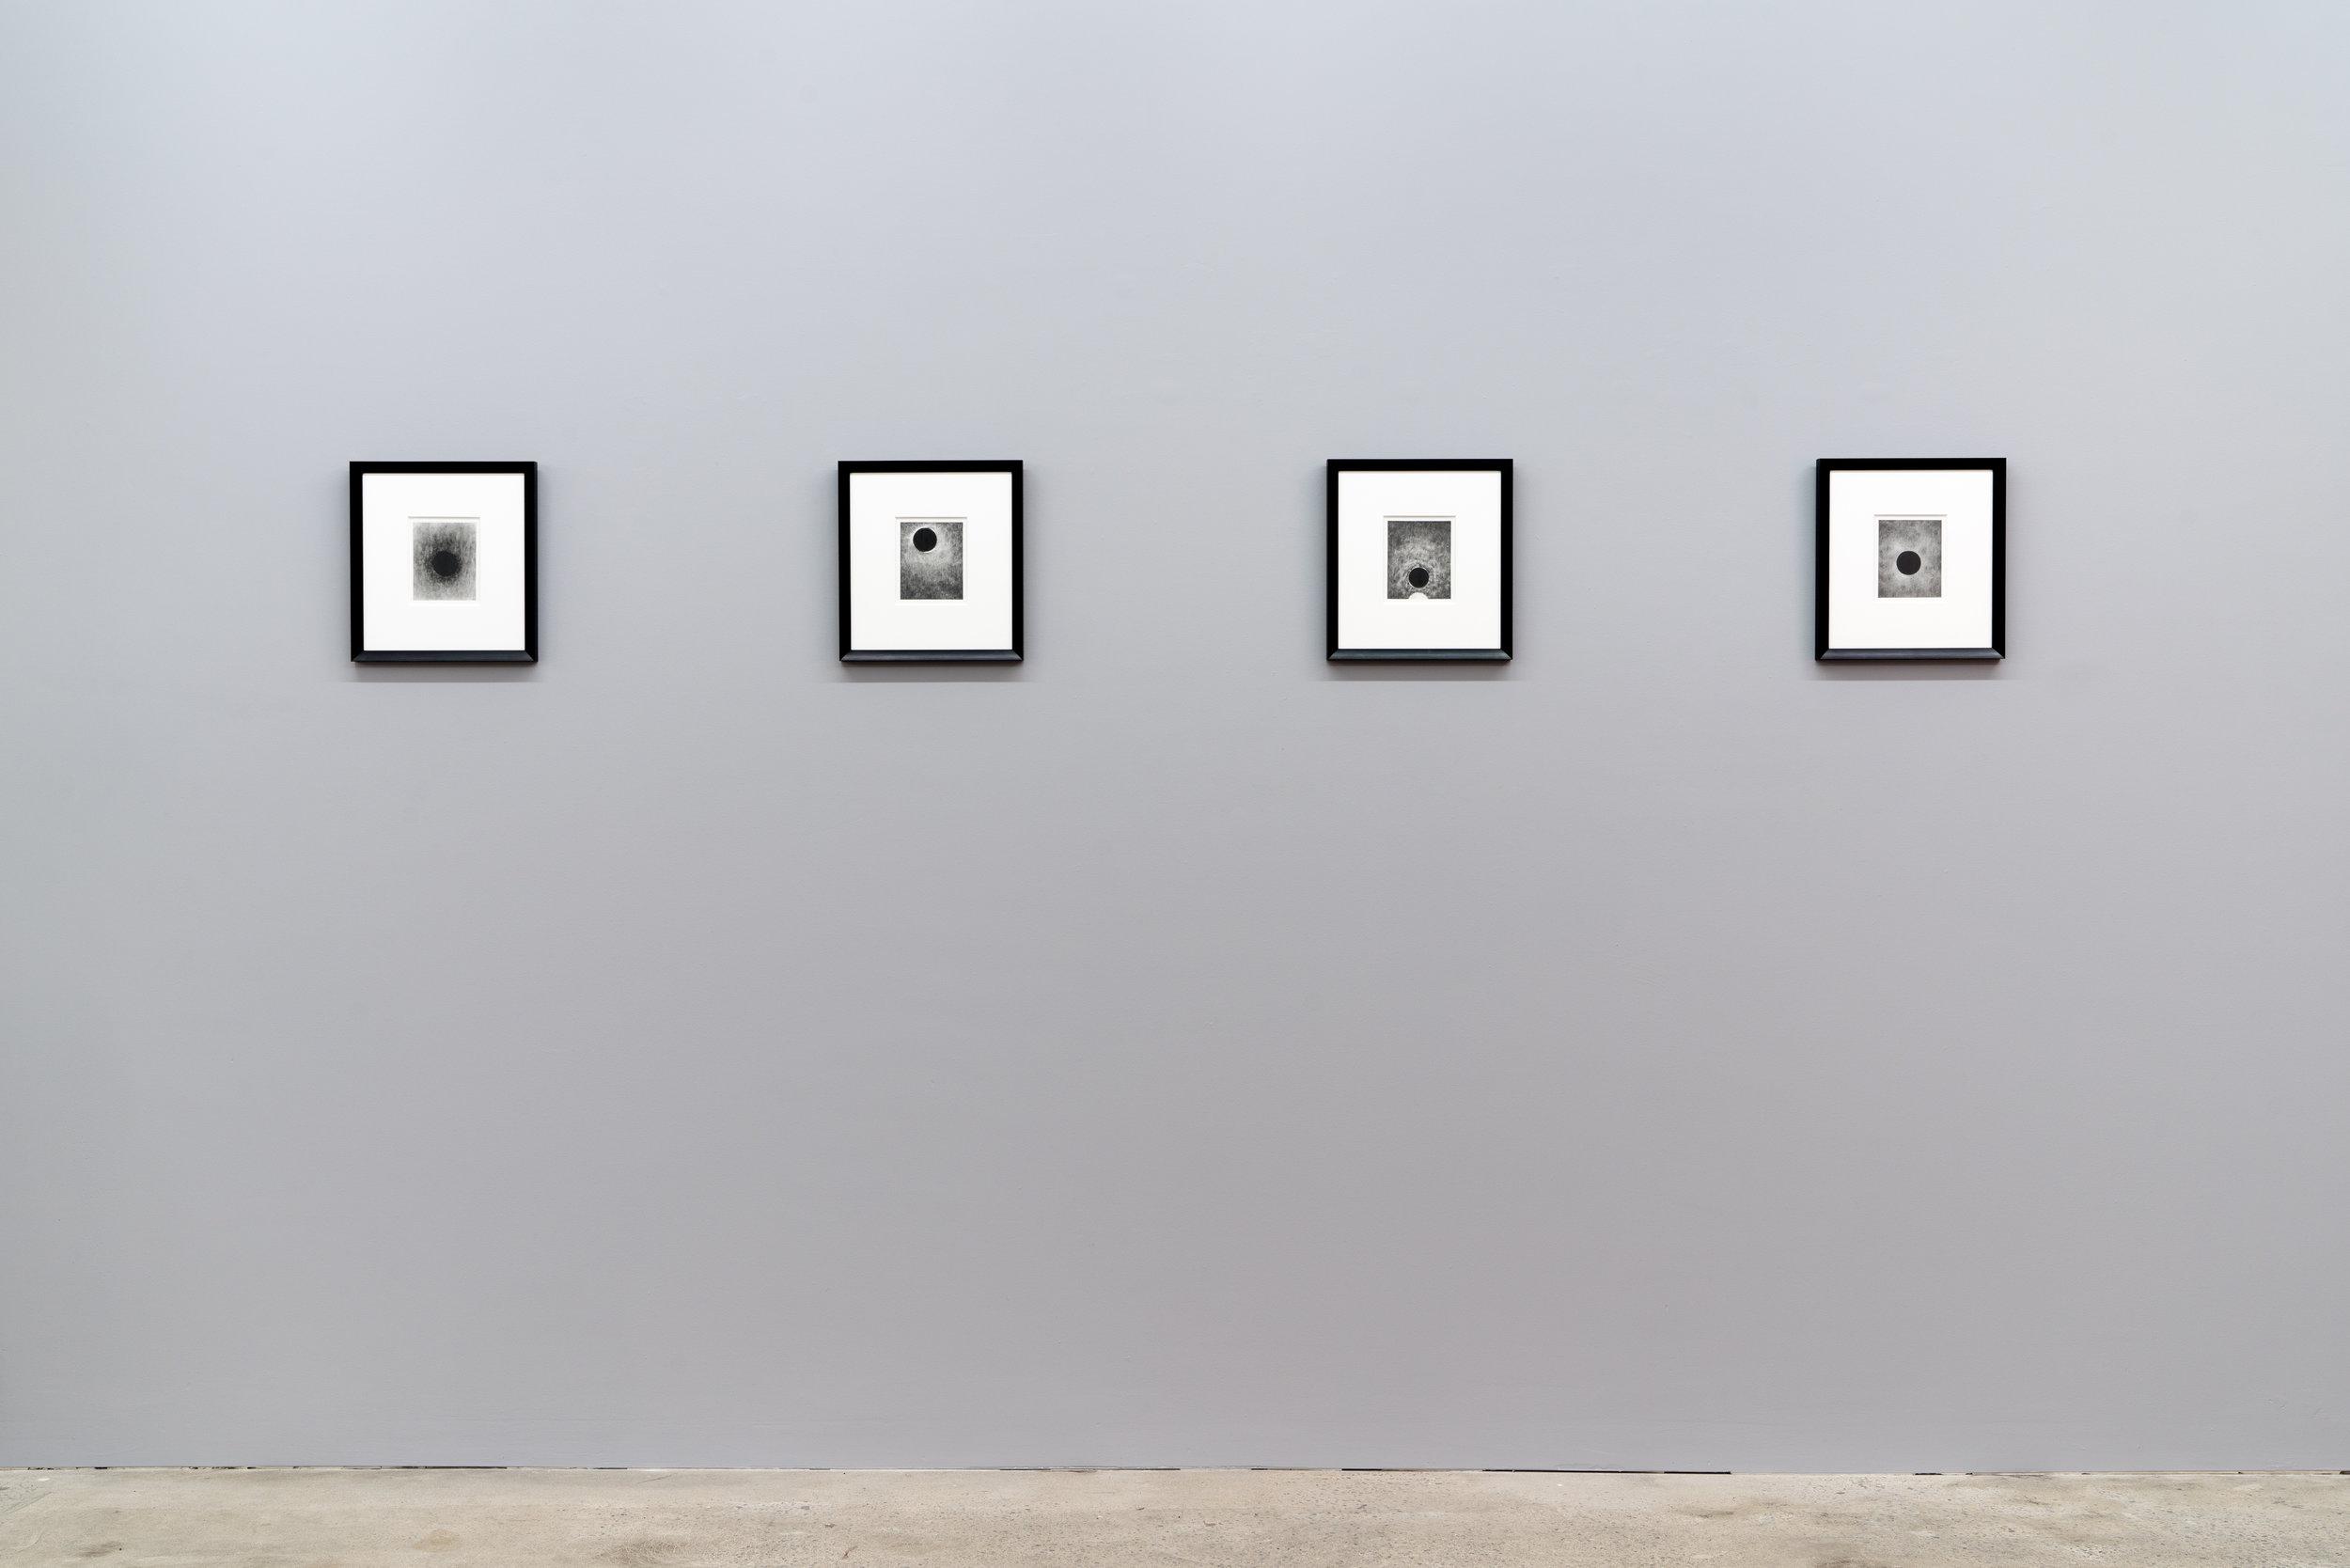 Carl Trahan,  Das Gleitende - 2 , 2018, vue d'exposition, Galerie Nicolas Robert, photo : Jean-Michael Seminaro